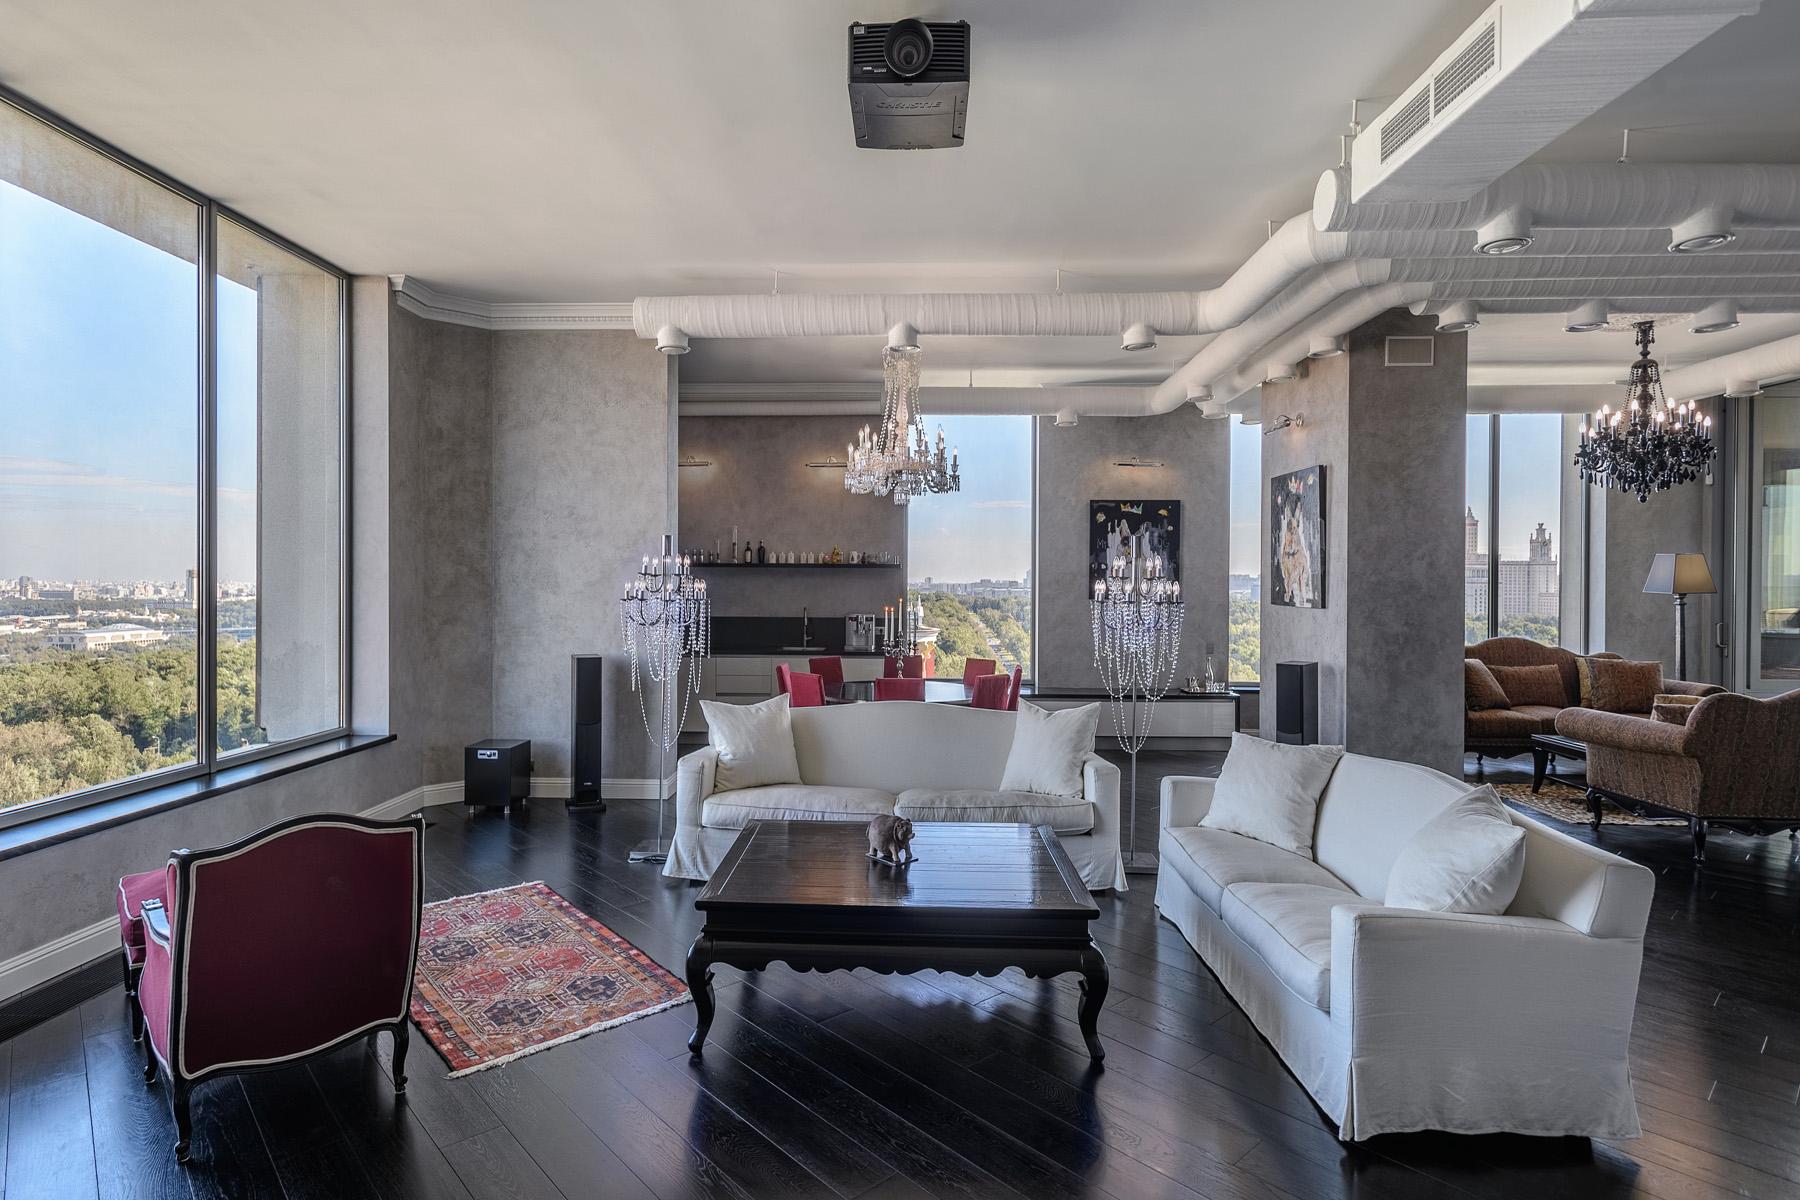 Apartments için Kiralama at Luxury penthouse apartment in Lomonosov Residential Complex Moscow, Moskova Rusya